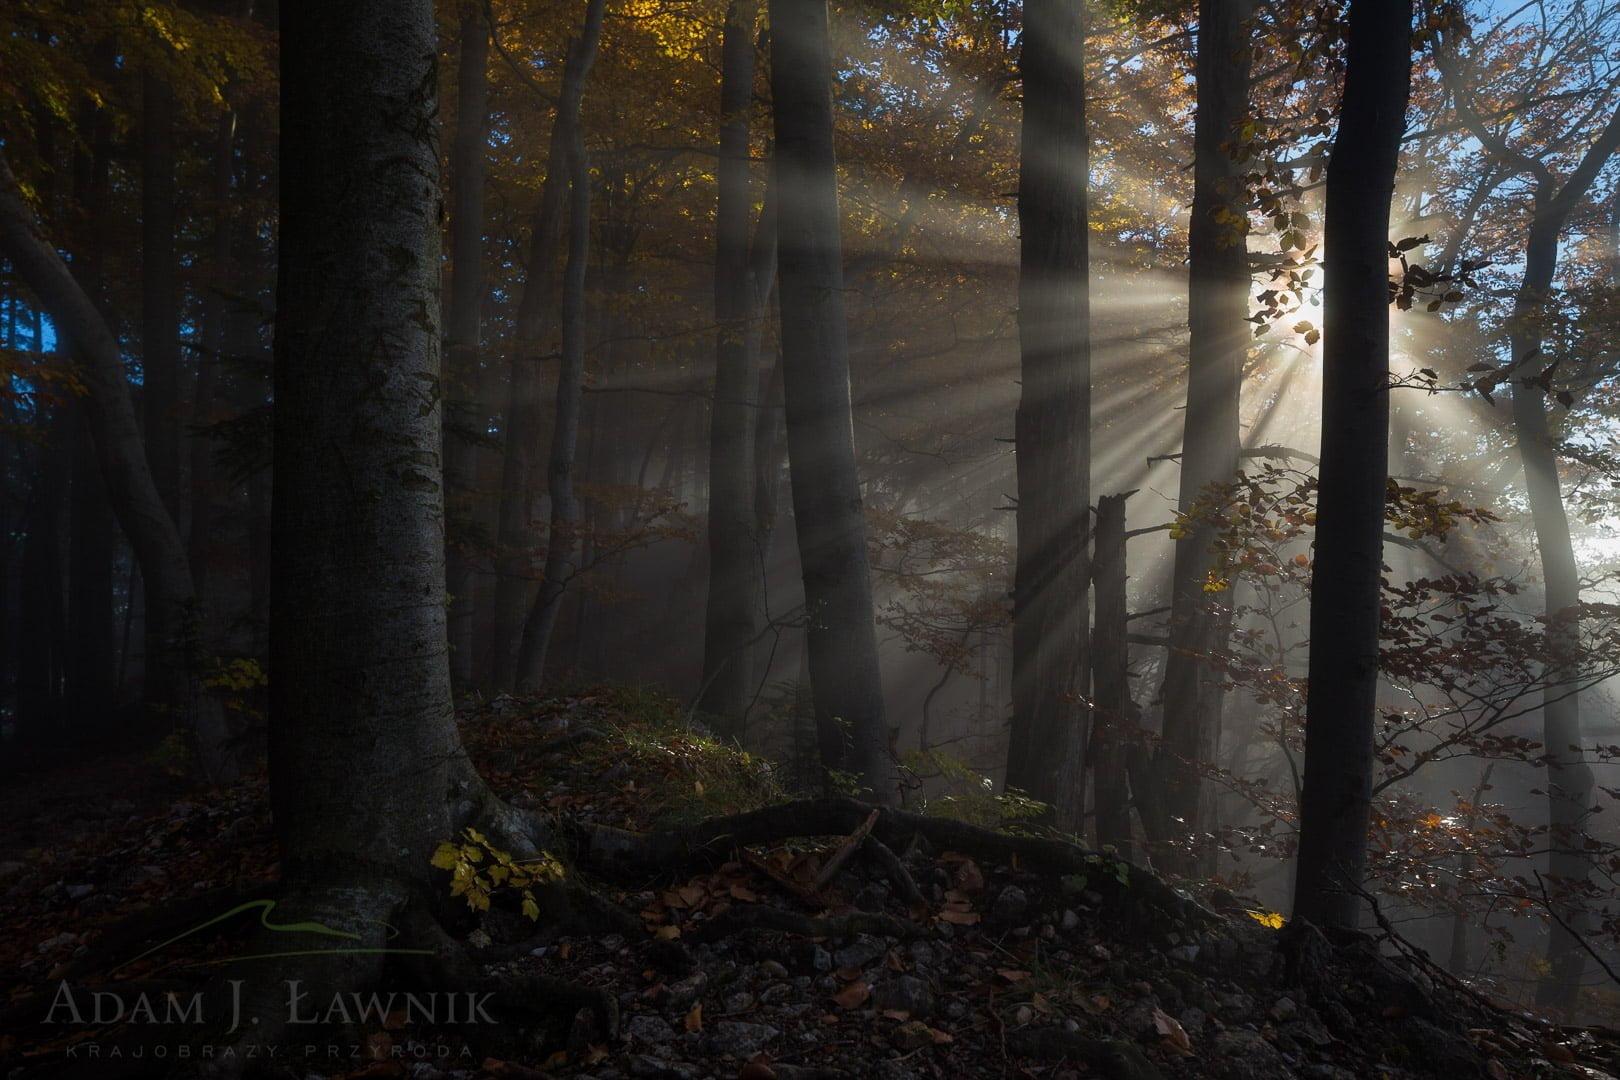 Pieniny National Park, Poland 1510-01373C